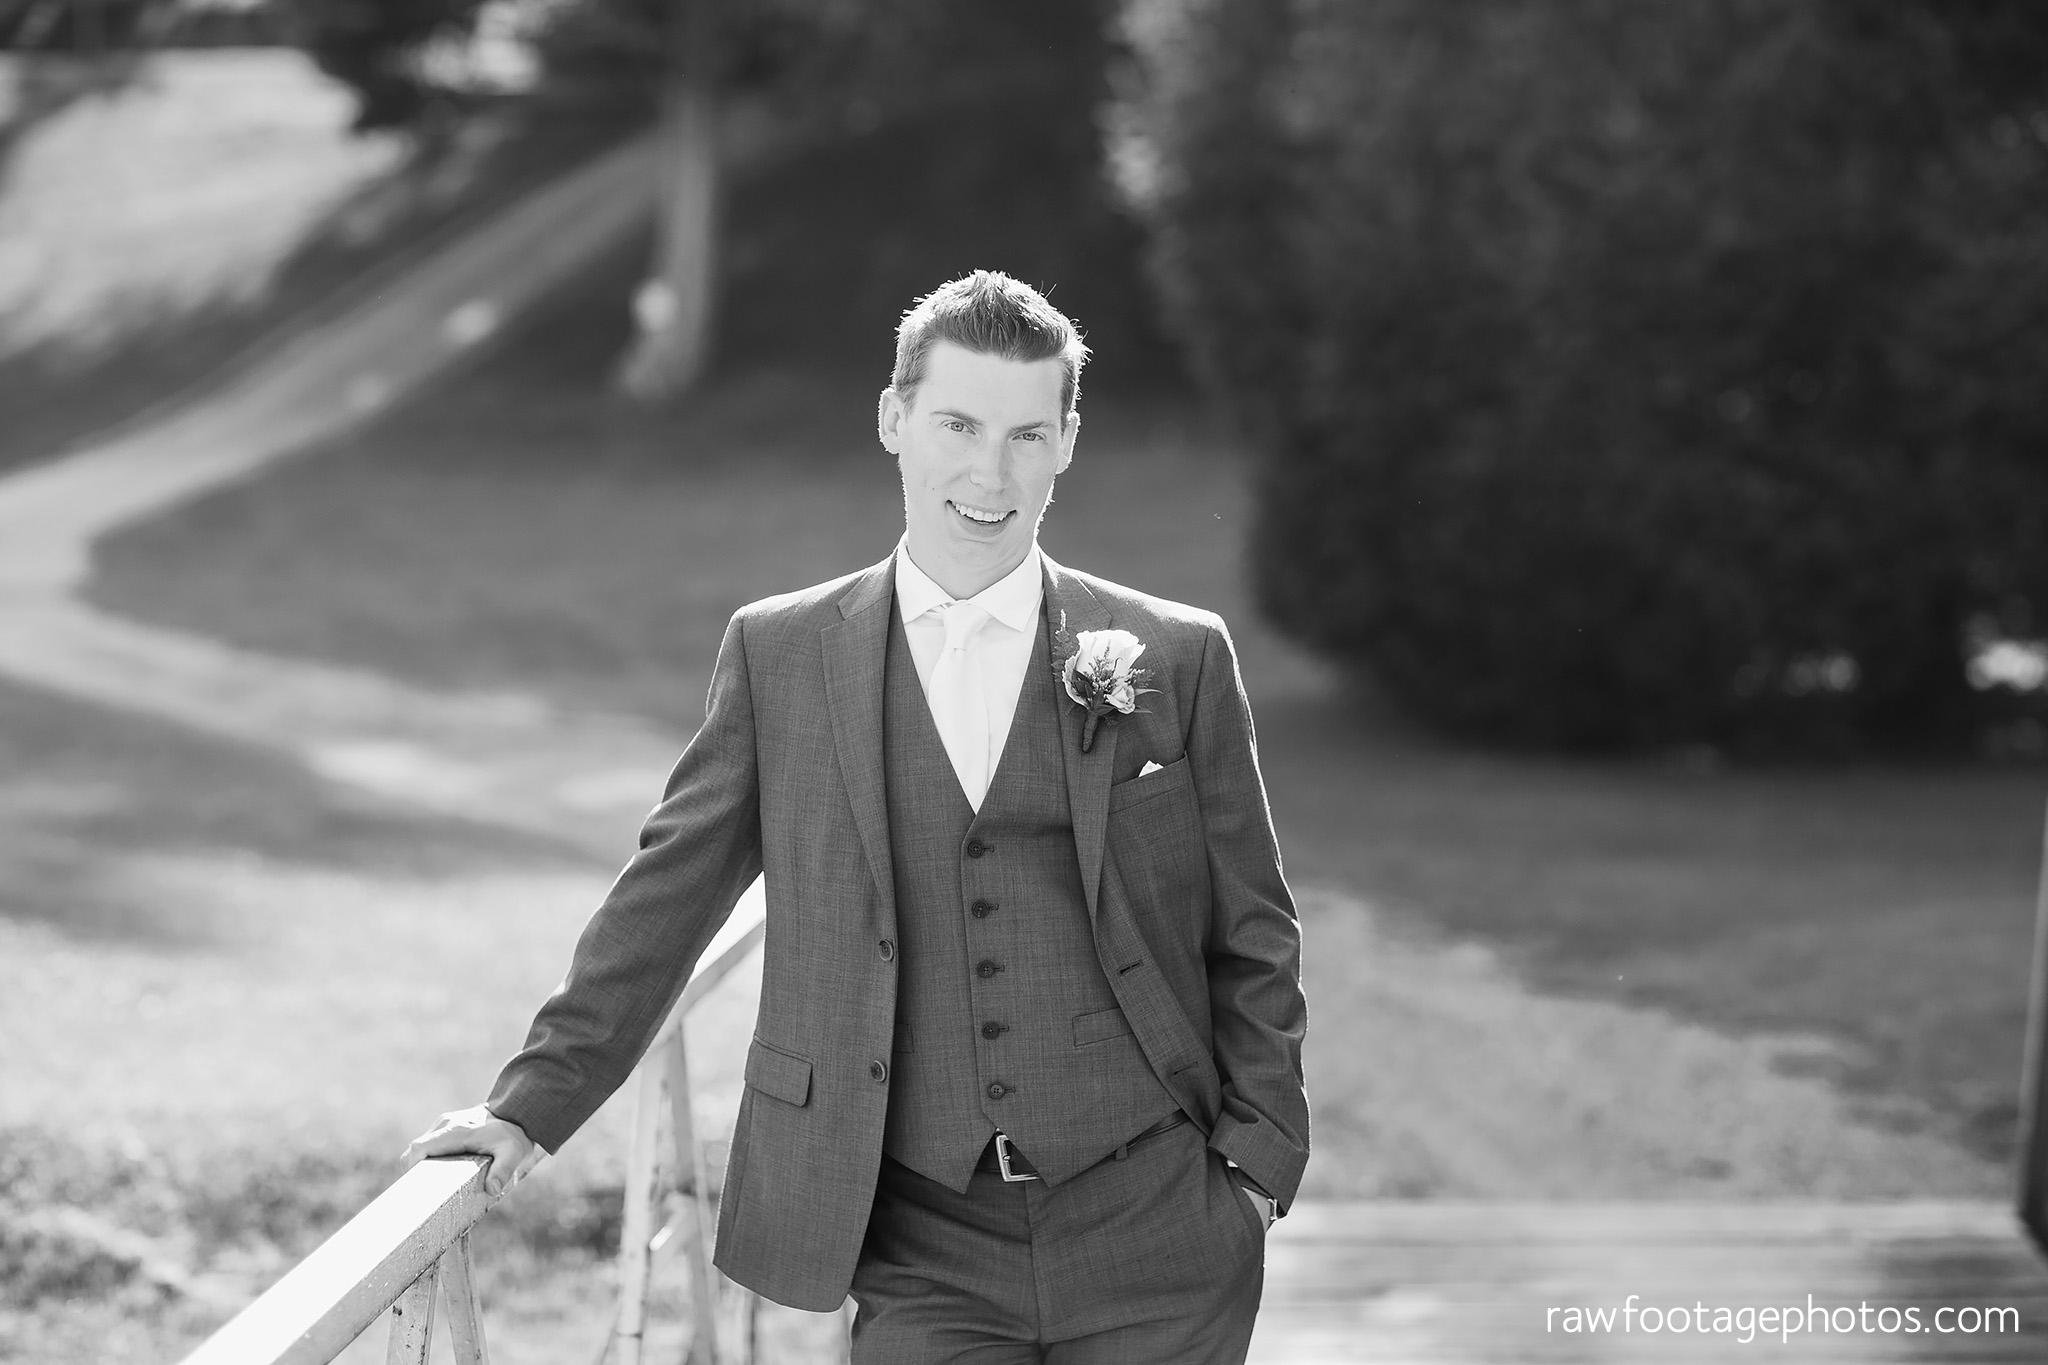 london_ontario_wedding_photographer-grand_bend_wedding_photographer-oakwood_resort_wedding-beach_wedding-sunset_wedding-raw_footage_photography053.jpg